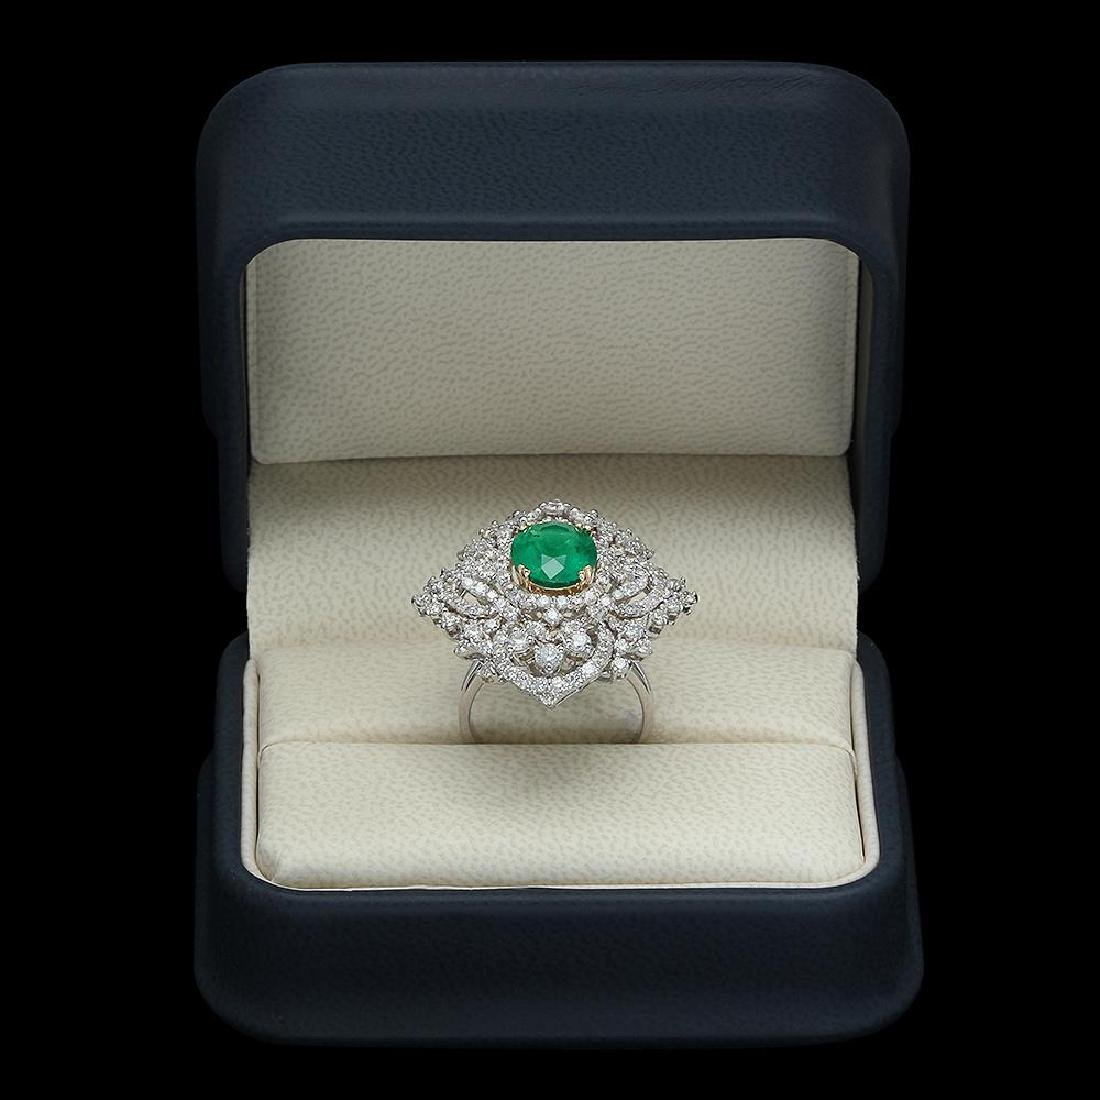 18K Gold 3.11 Emerald 3.22 Diamond Ring - 4